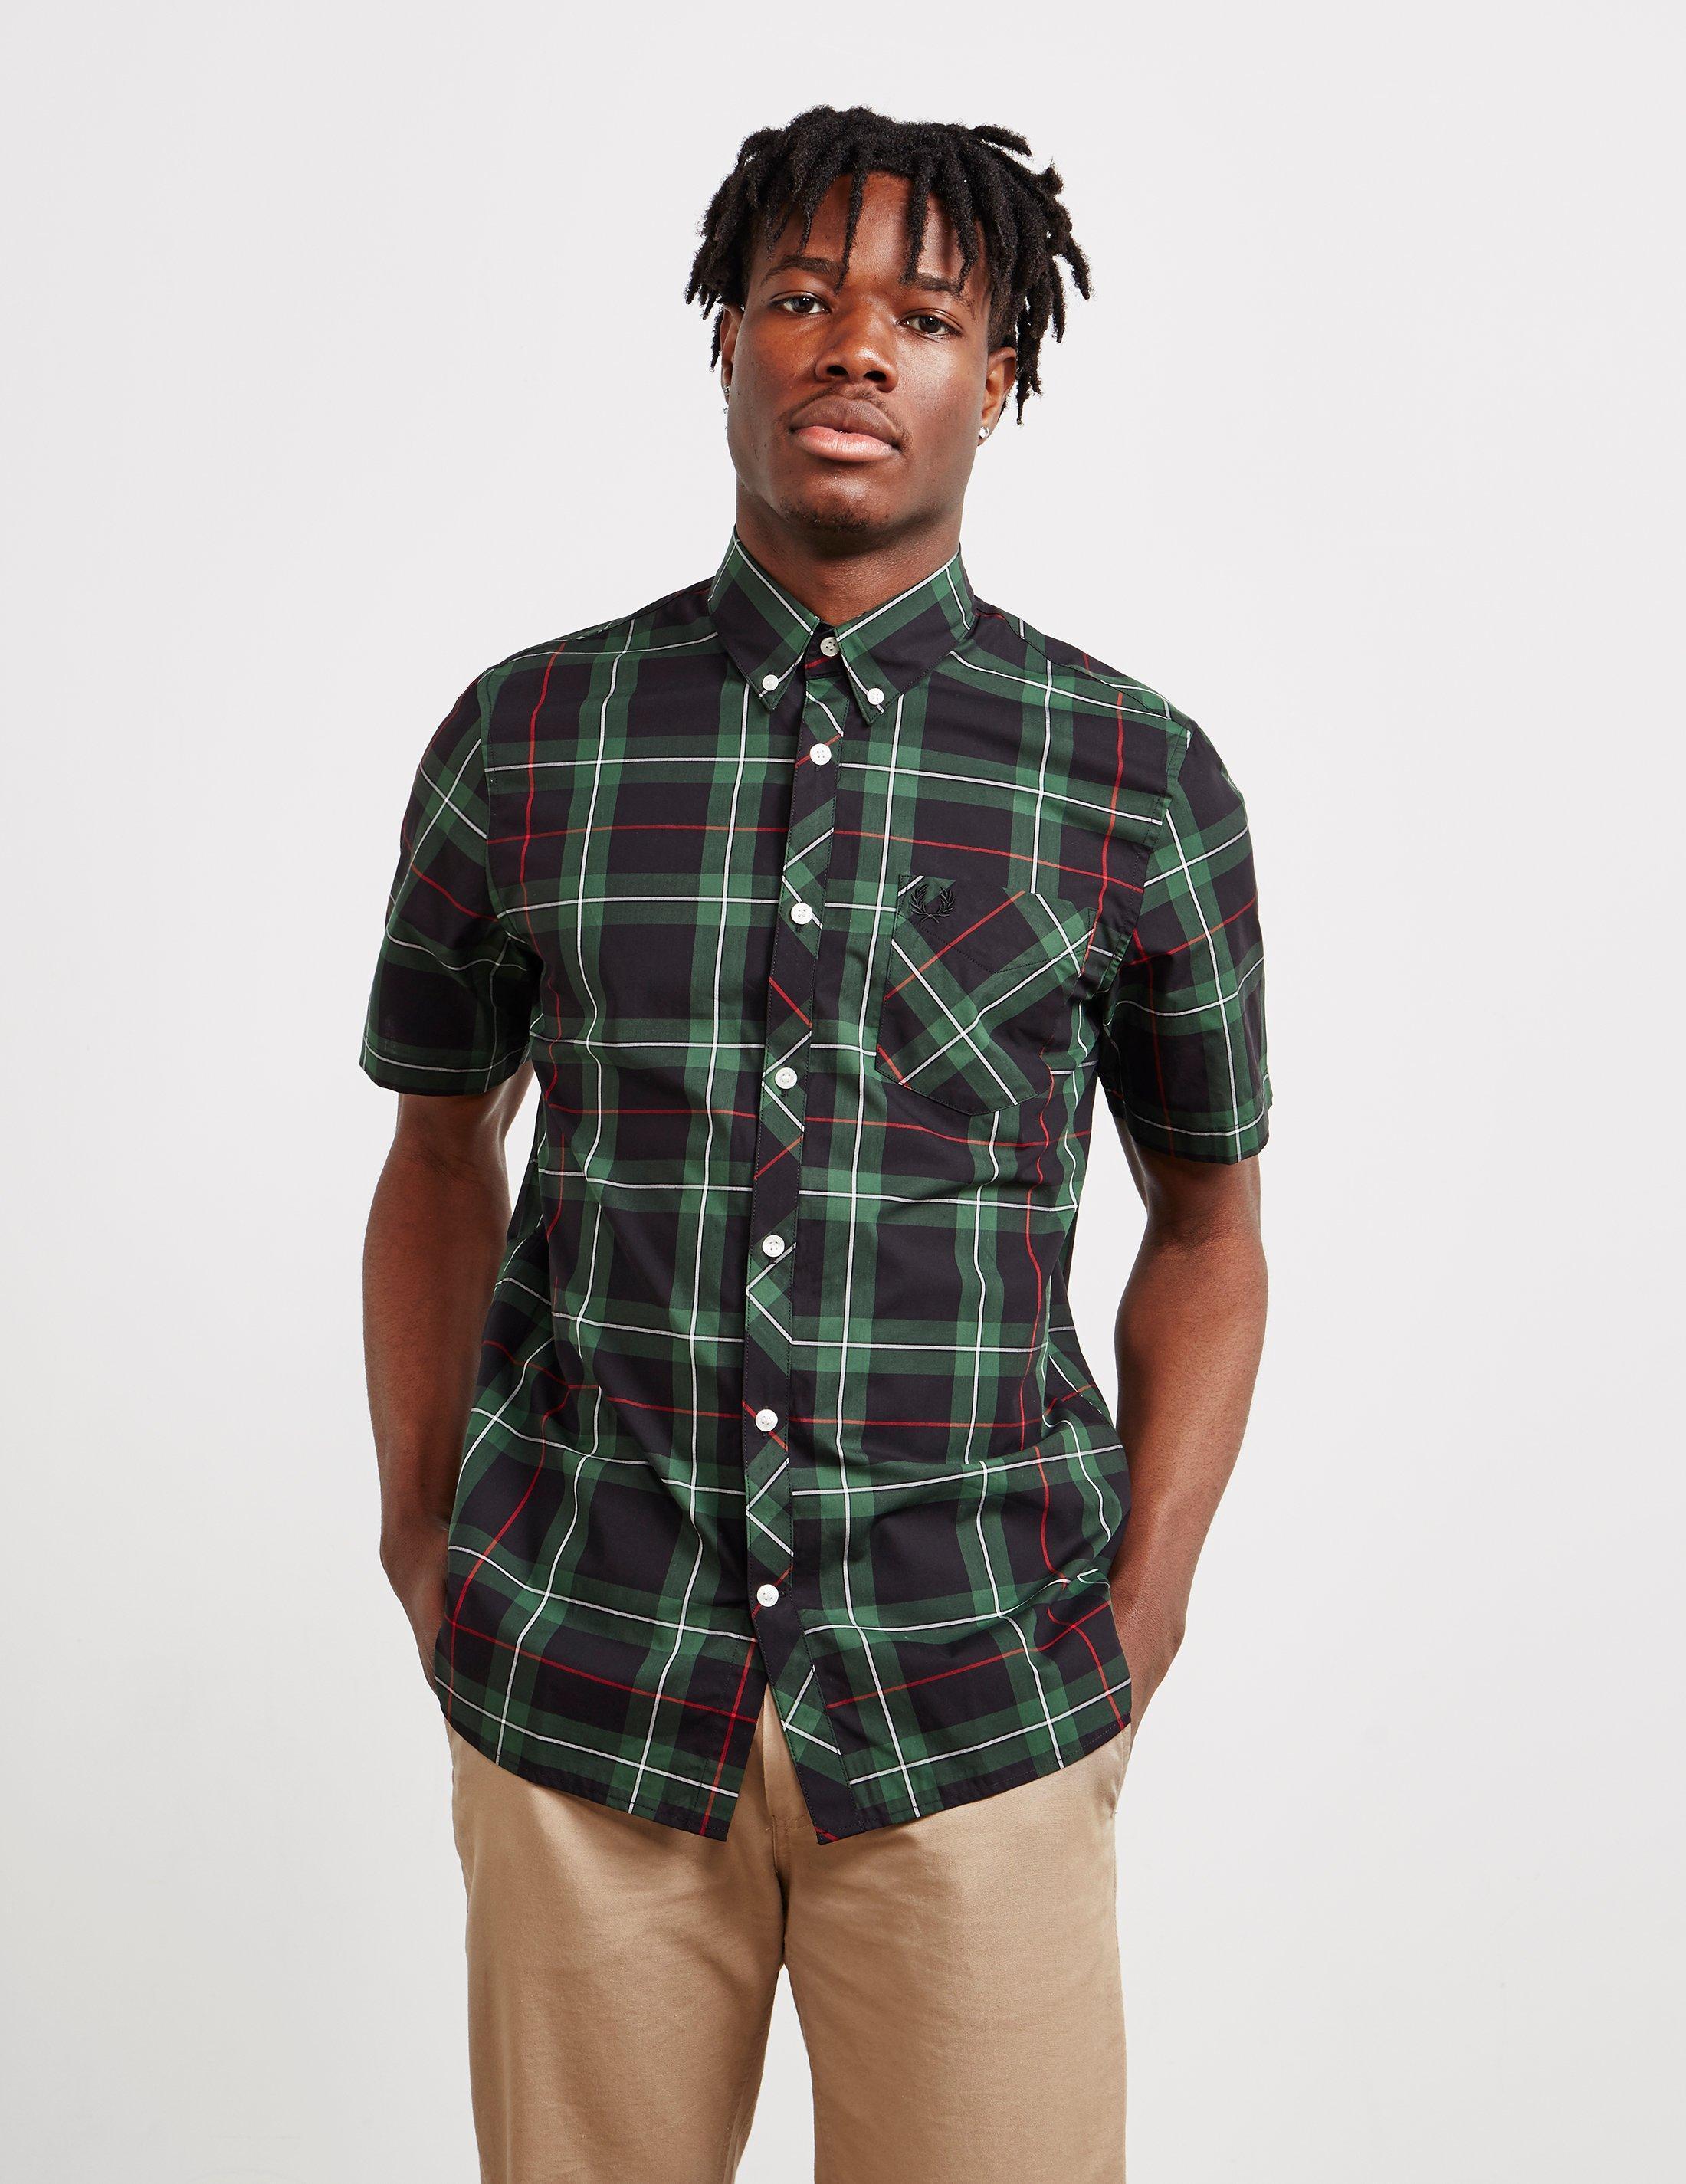 0033a9df04d Lyst - Fred Perry Tartan Short Sleeve Shirt Green in Green for Men